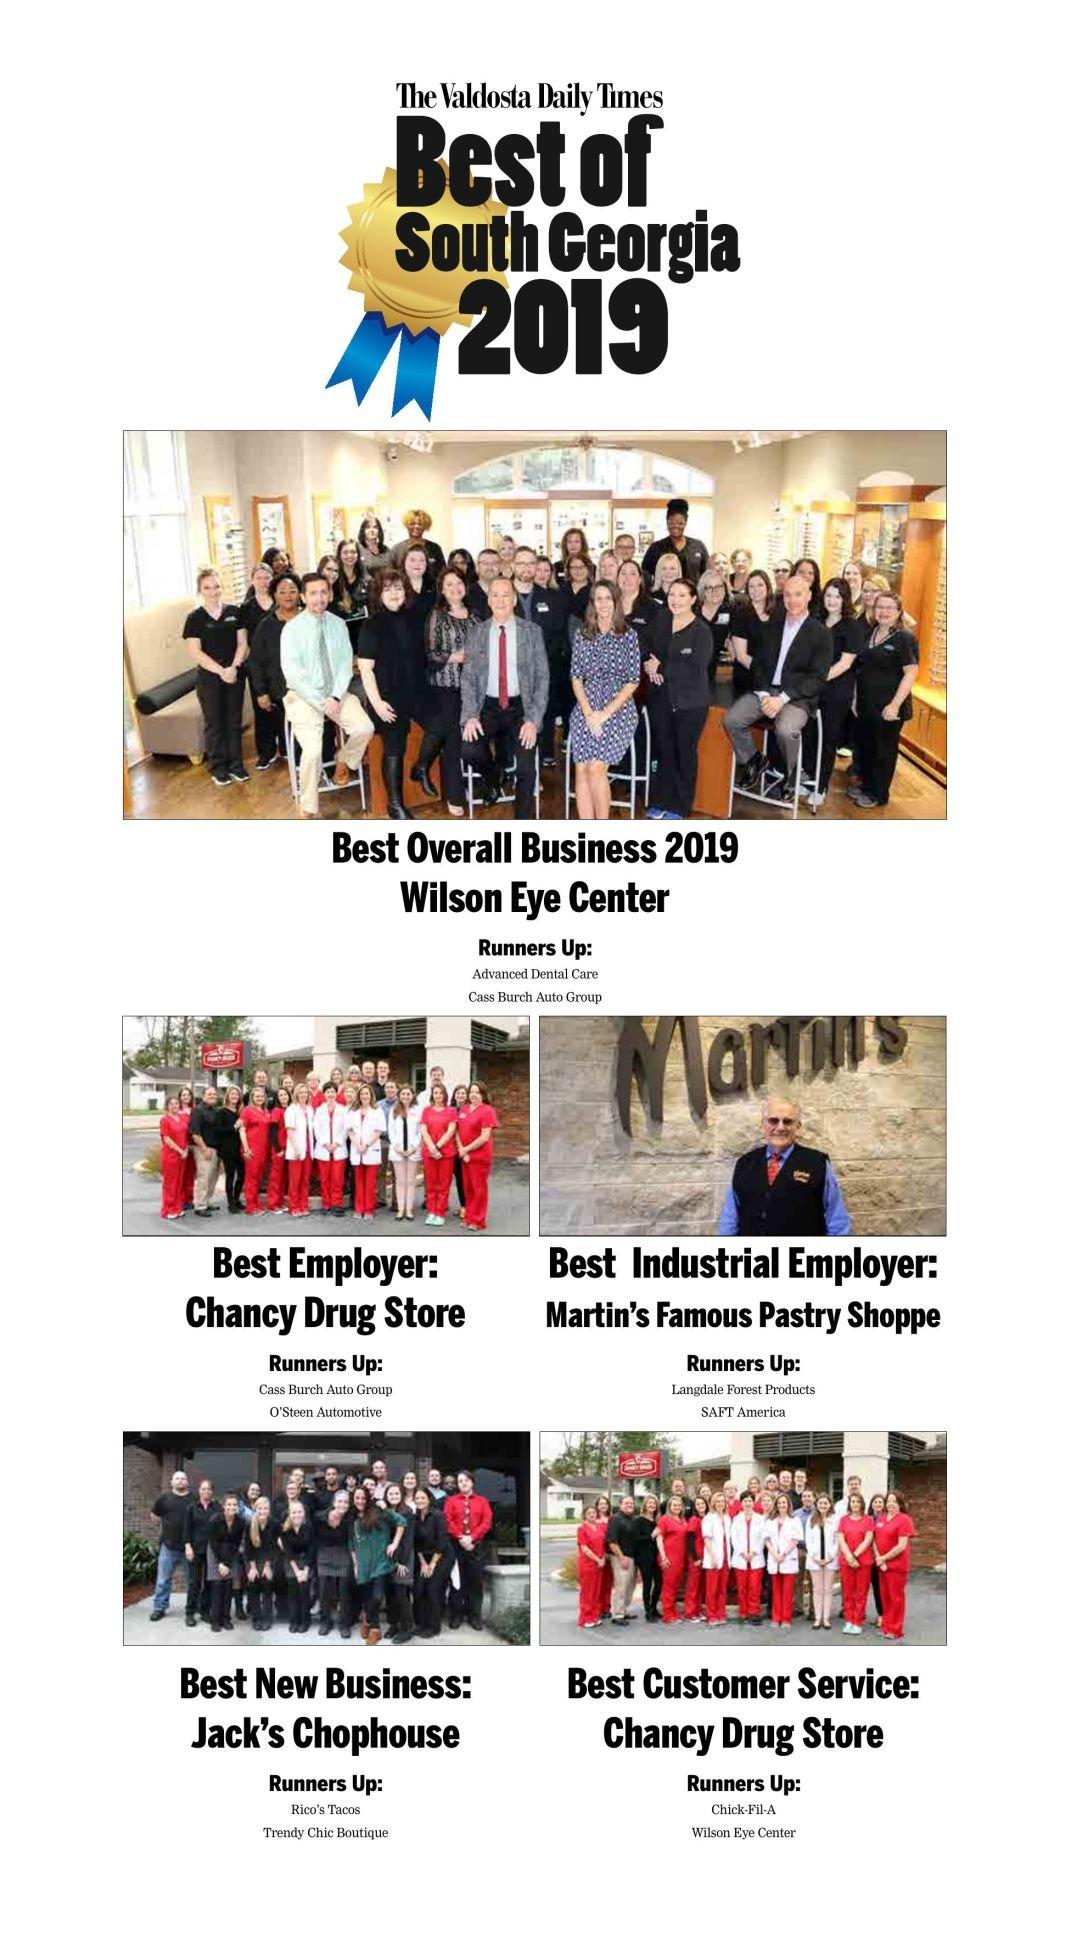 Best of South Georgia 2019